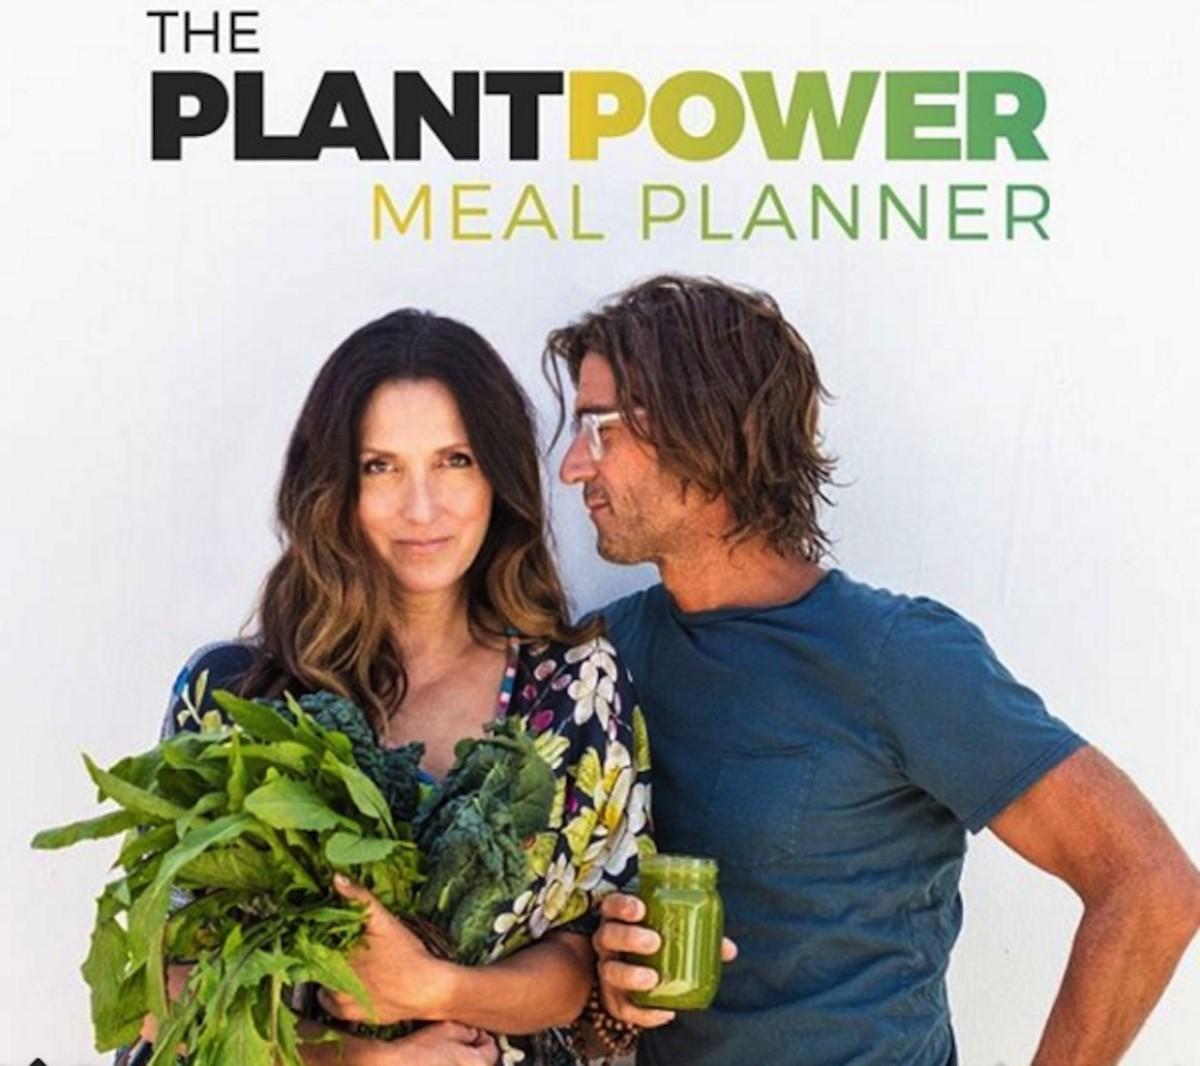 PlantPower Meal Planner